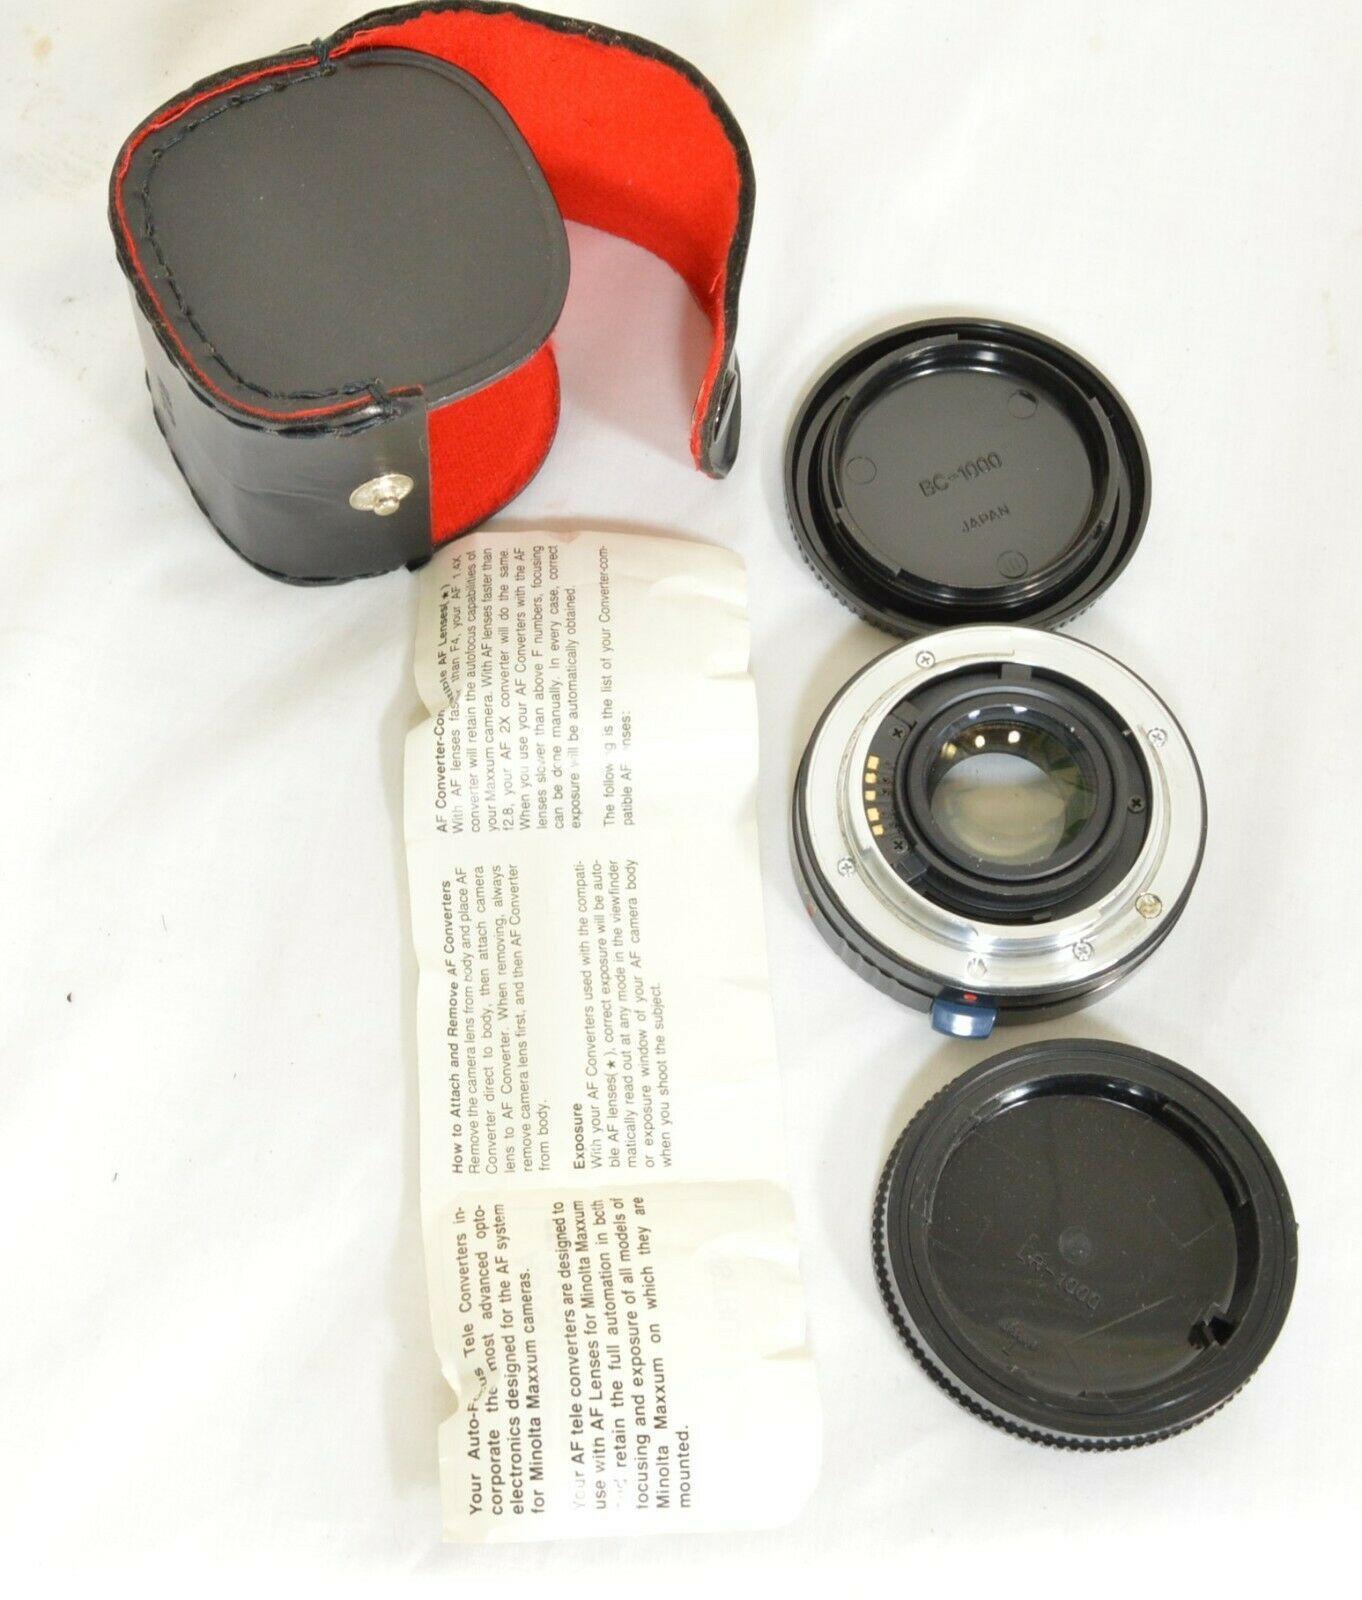 Kalimar 1.4 X M/AF Tele Converter Auto Focus camera lens w/ case & instructions image 7